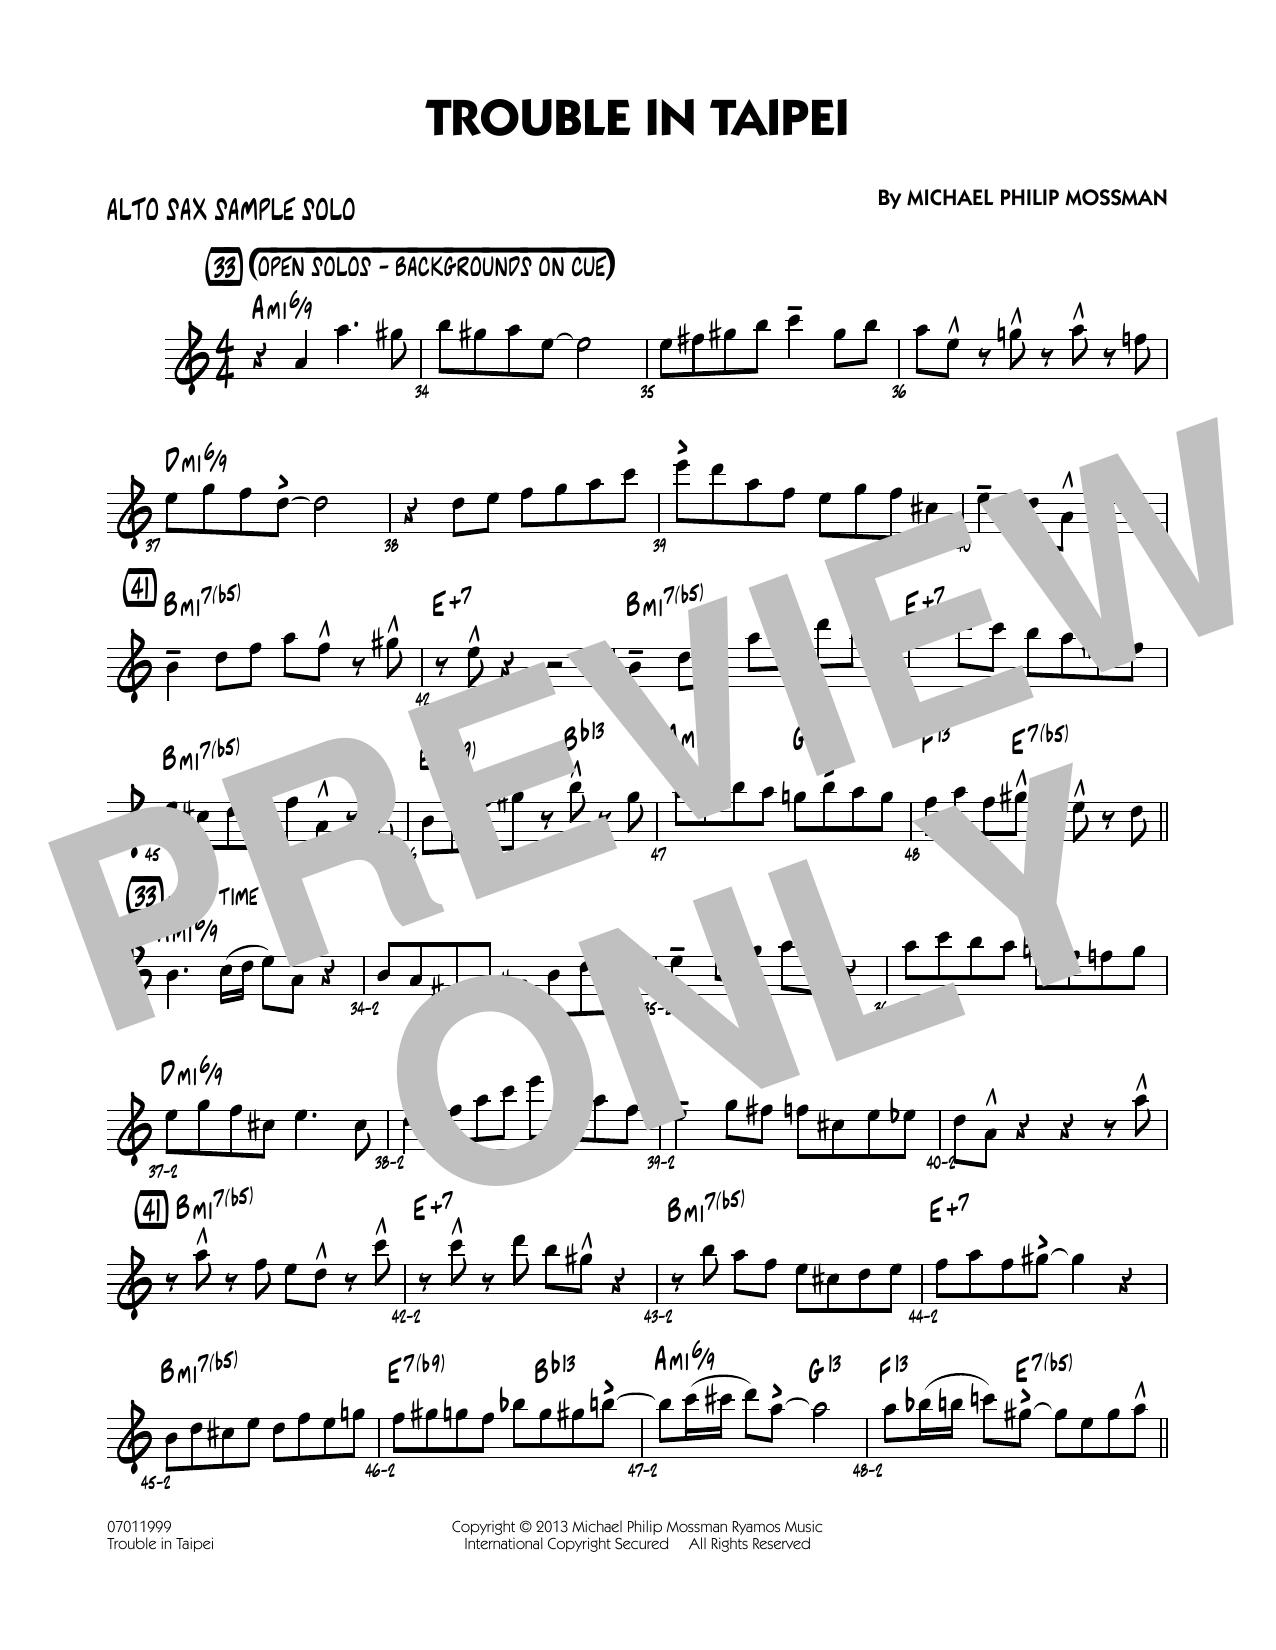 Trouble In Taipei - Alto Sax Sample Solo Sheet Music